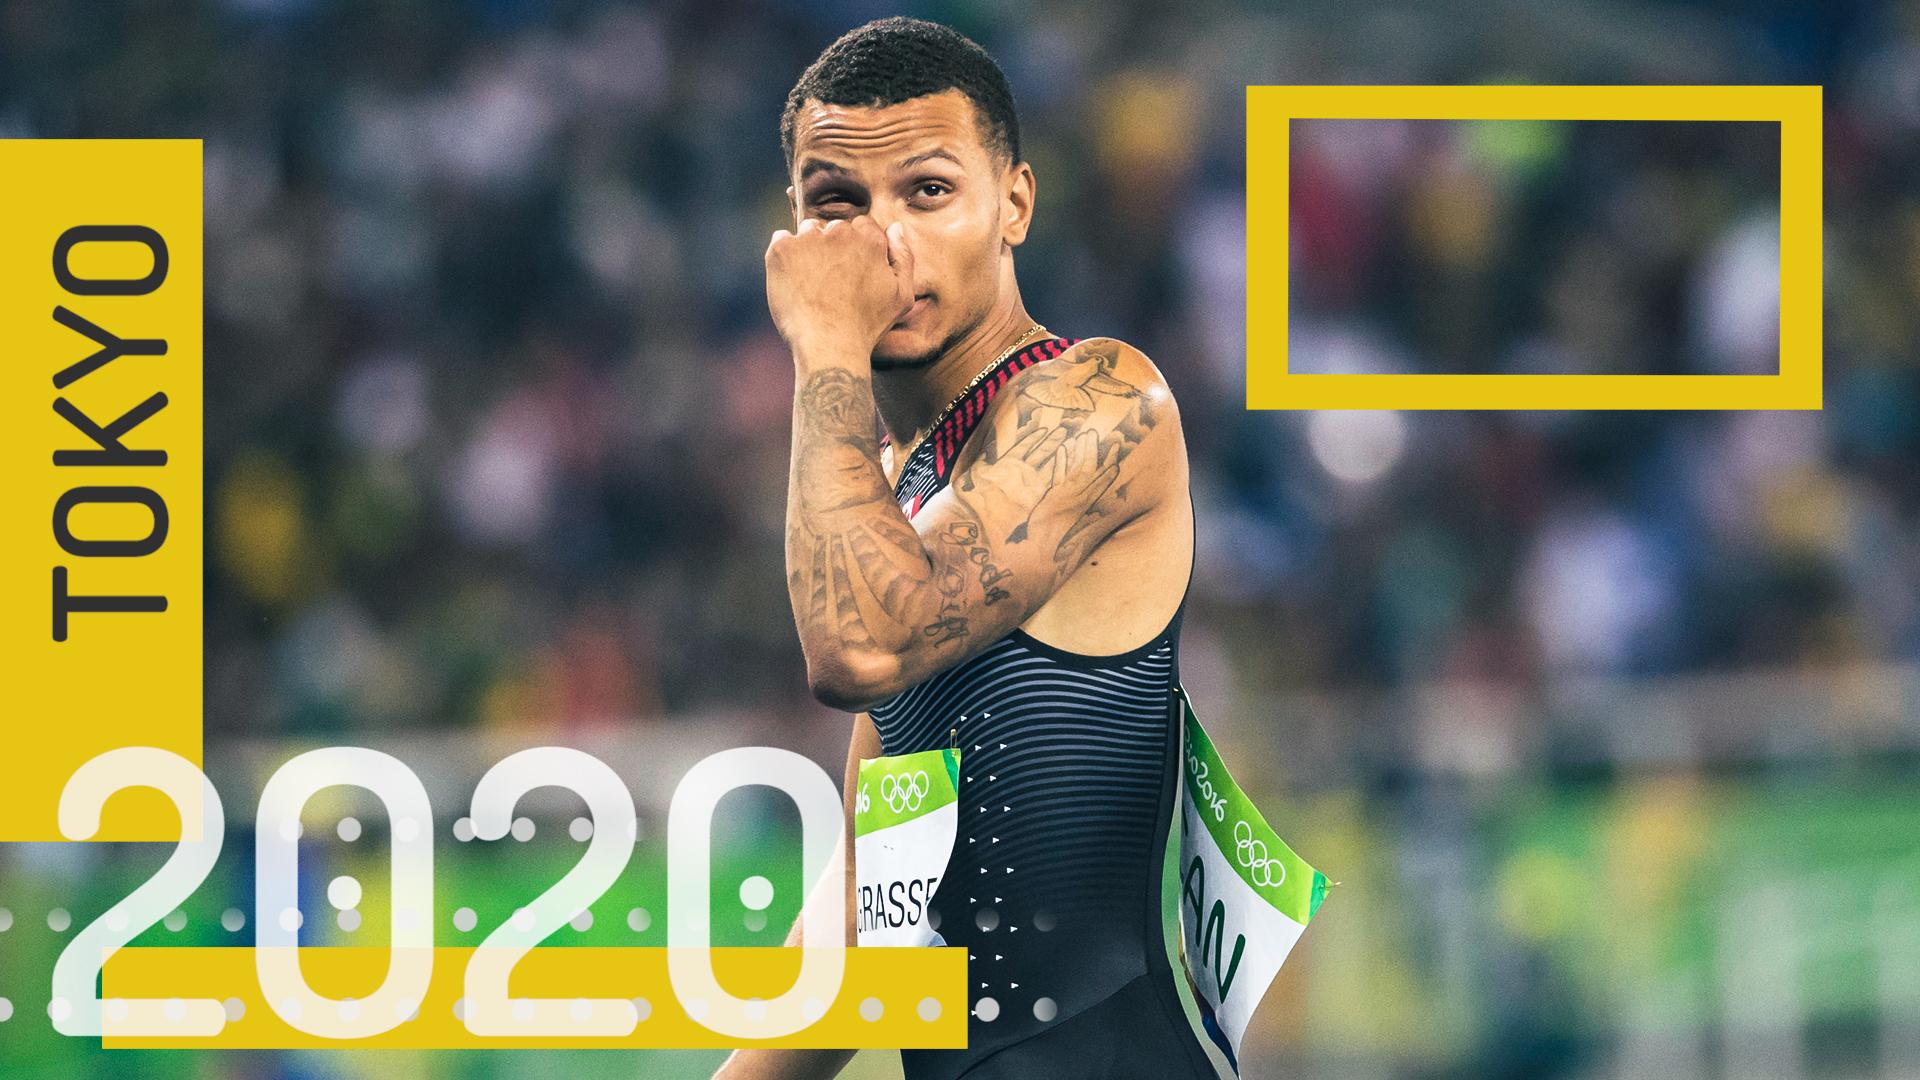 Defending silver medallist De Grasse, Brown move onto 200-metre semifinals